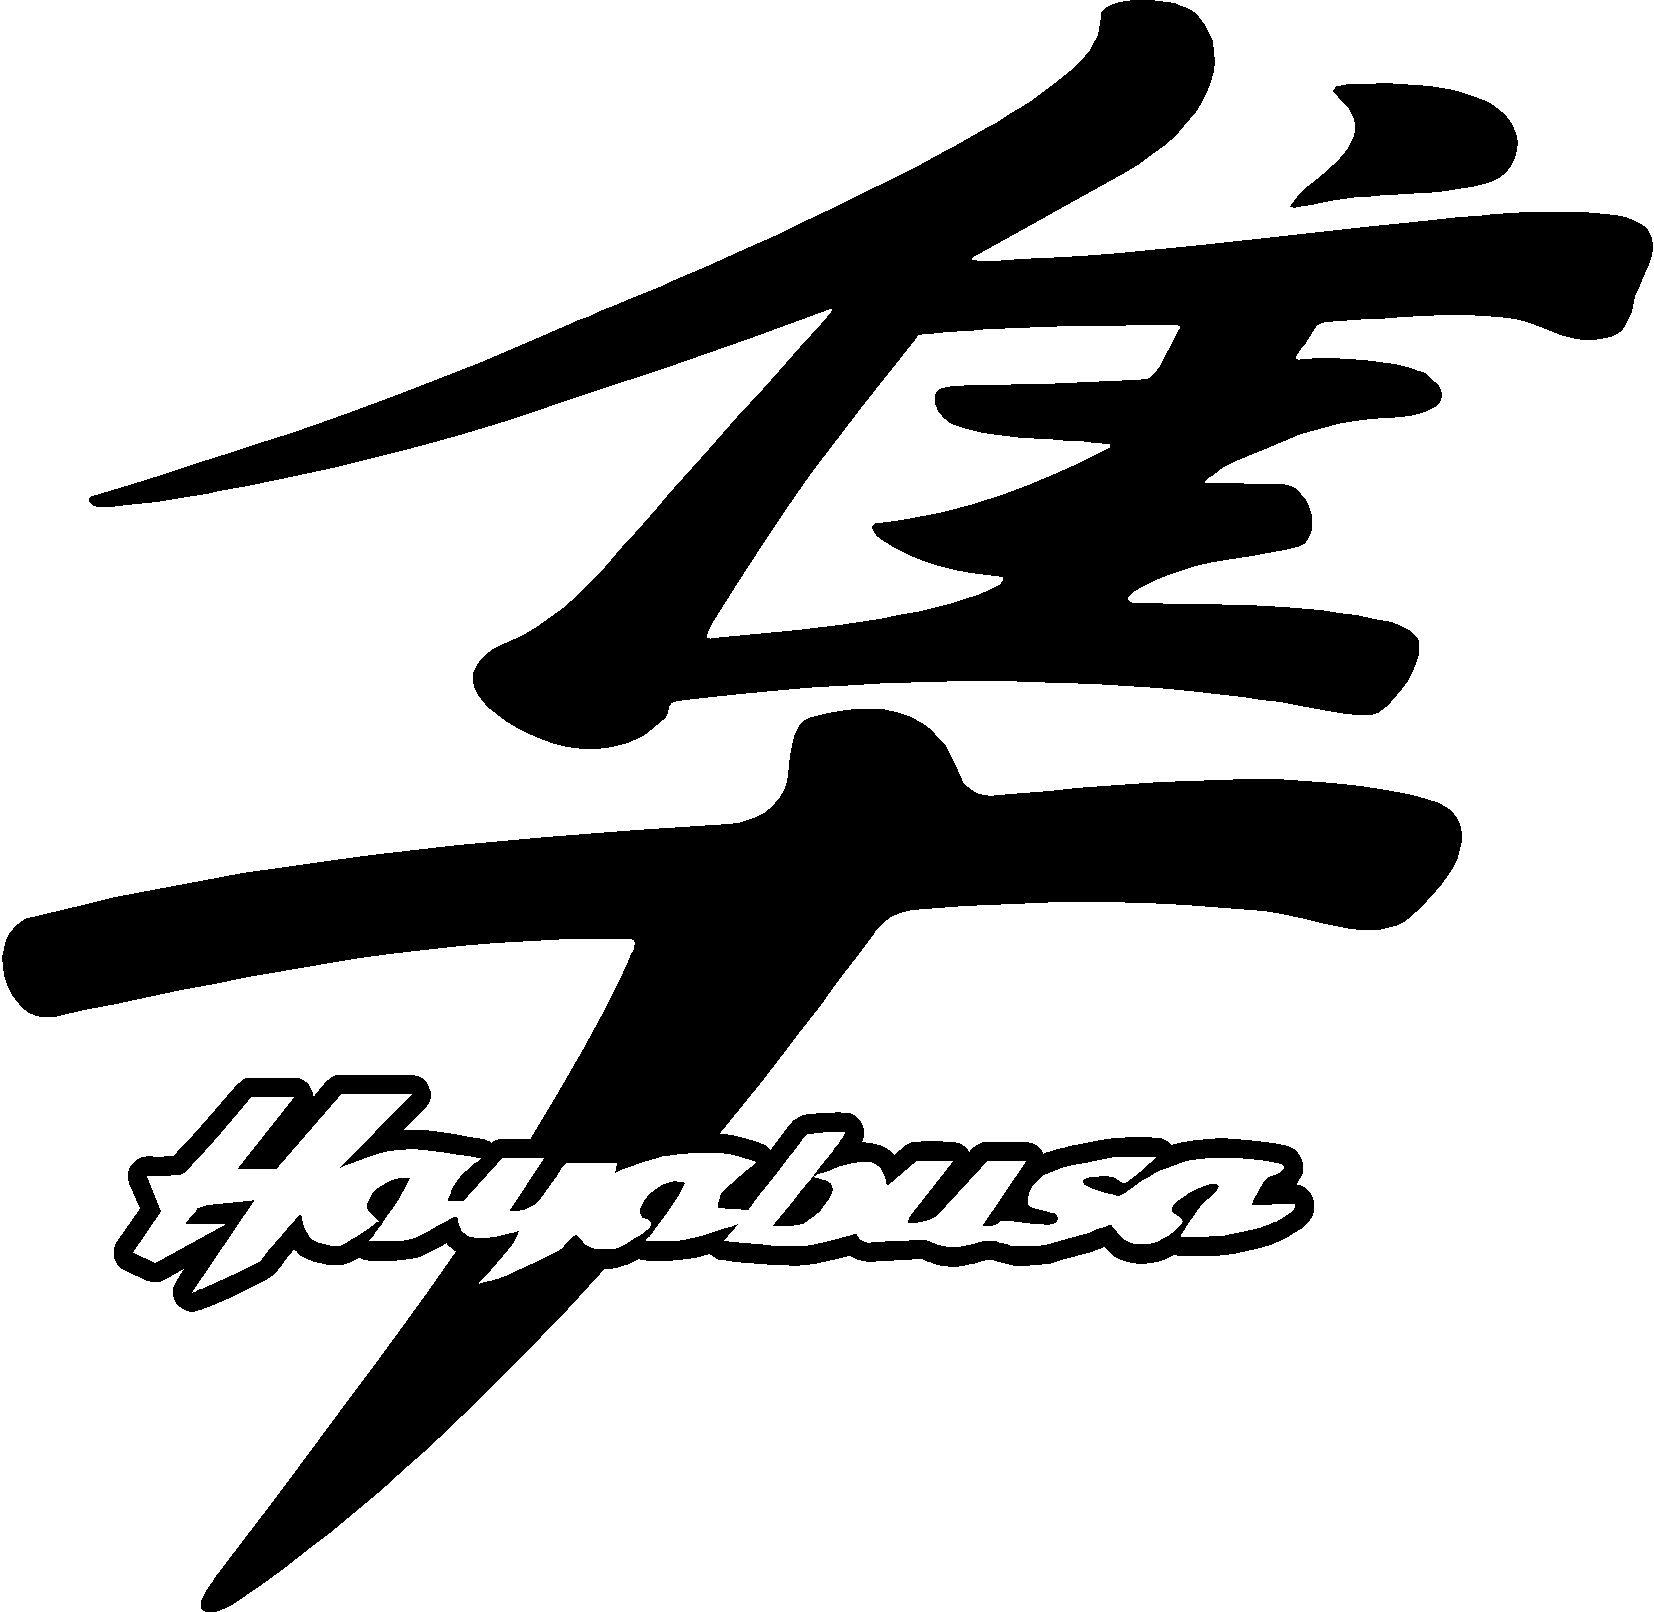 Sfesfefefeeg temporary tattoo sticker en71 china mainland tattoos behind the ear small tattoos behind the ear biocorpaavc